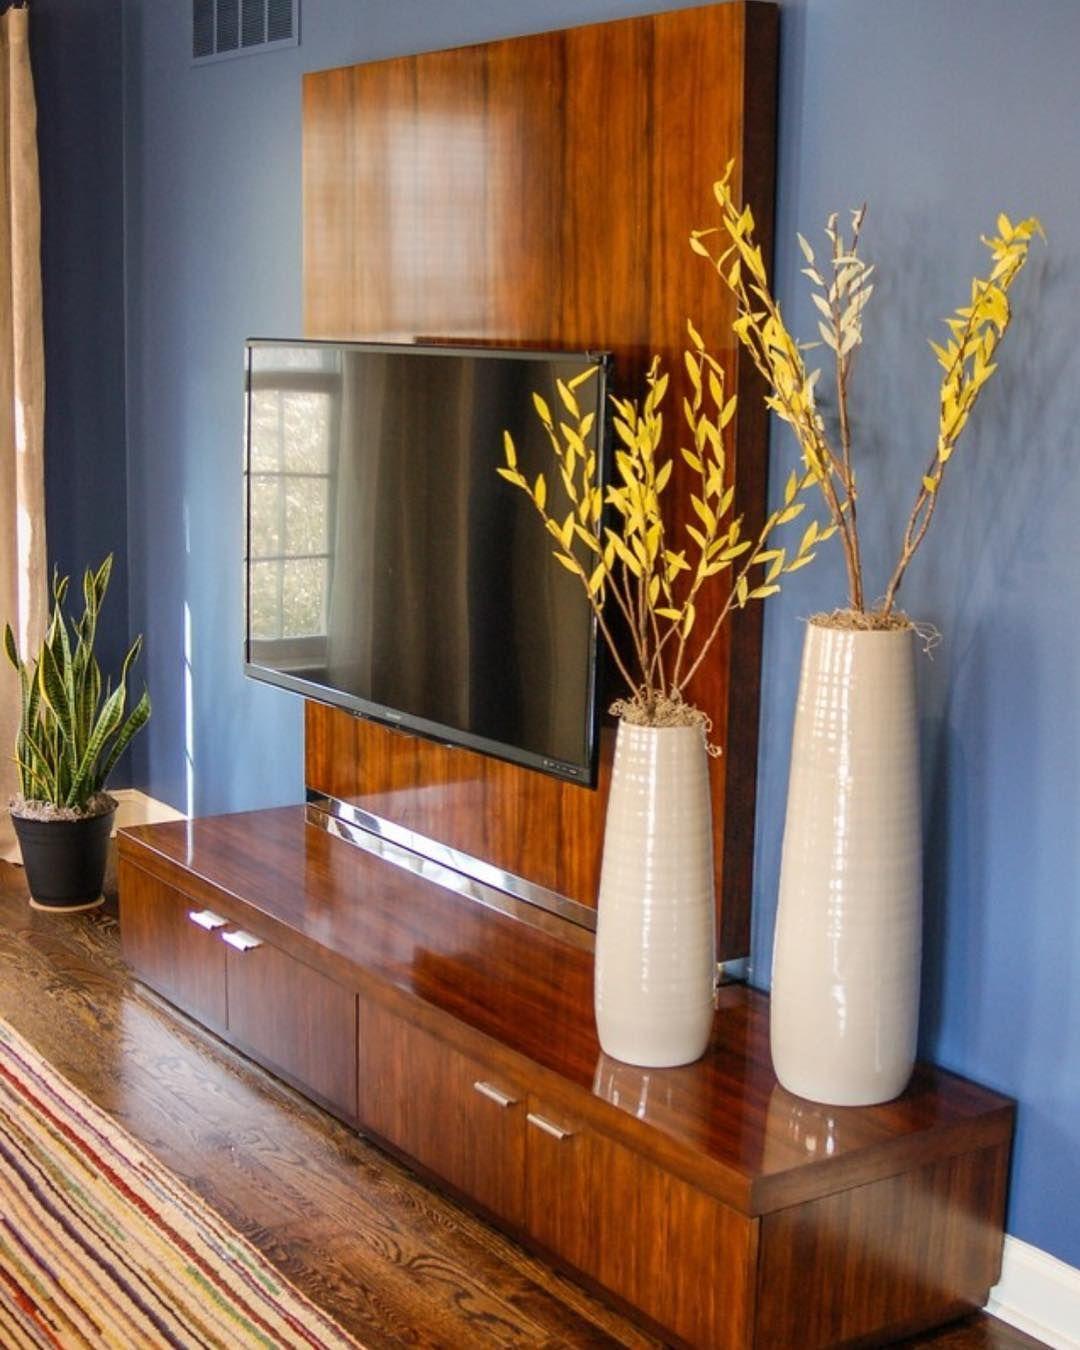 New The 10 Best Home Decor With Pictures خلفية التلفزيون ولا ابسط من كذا اي منجرة تسويه Living Room Design Modern Living Room Photos Living Room Designs